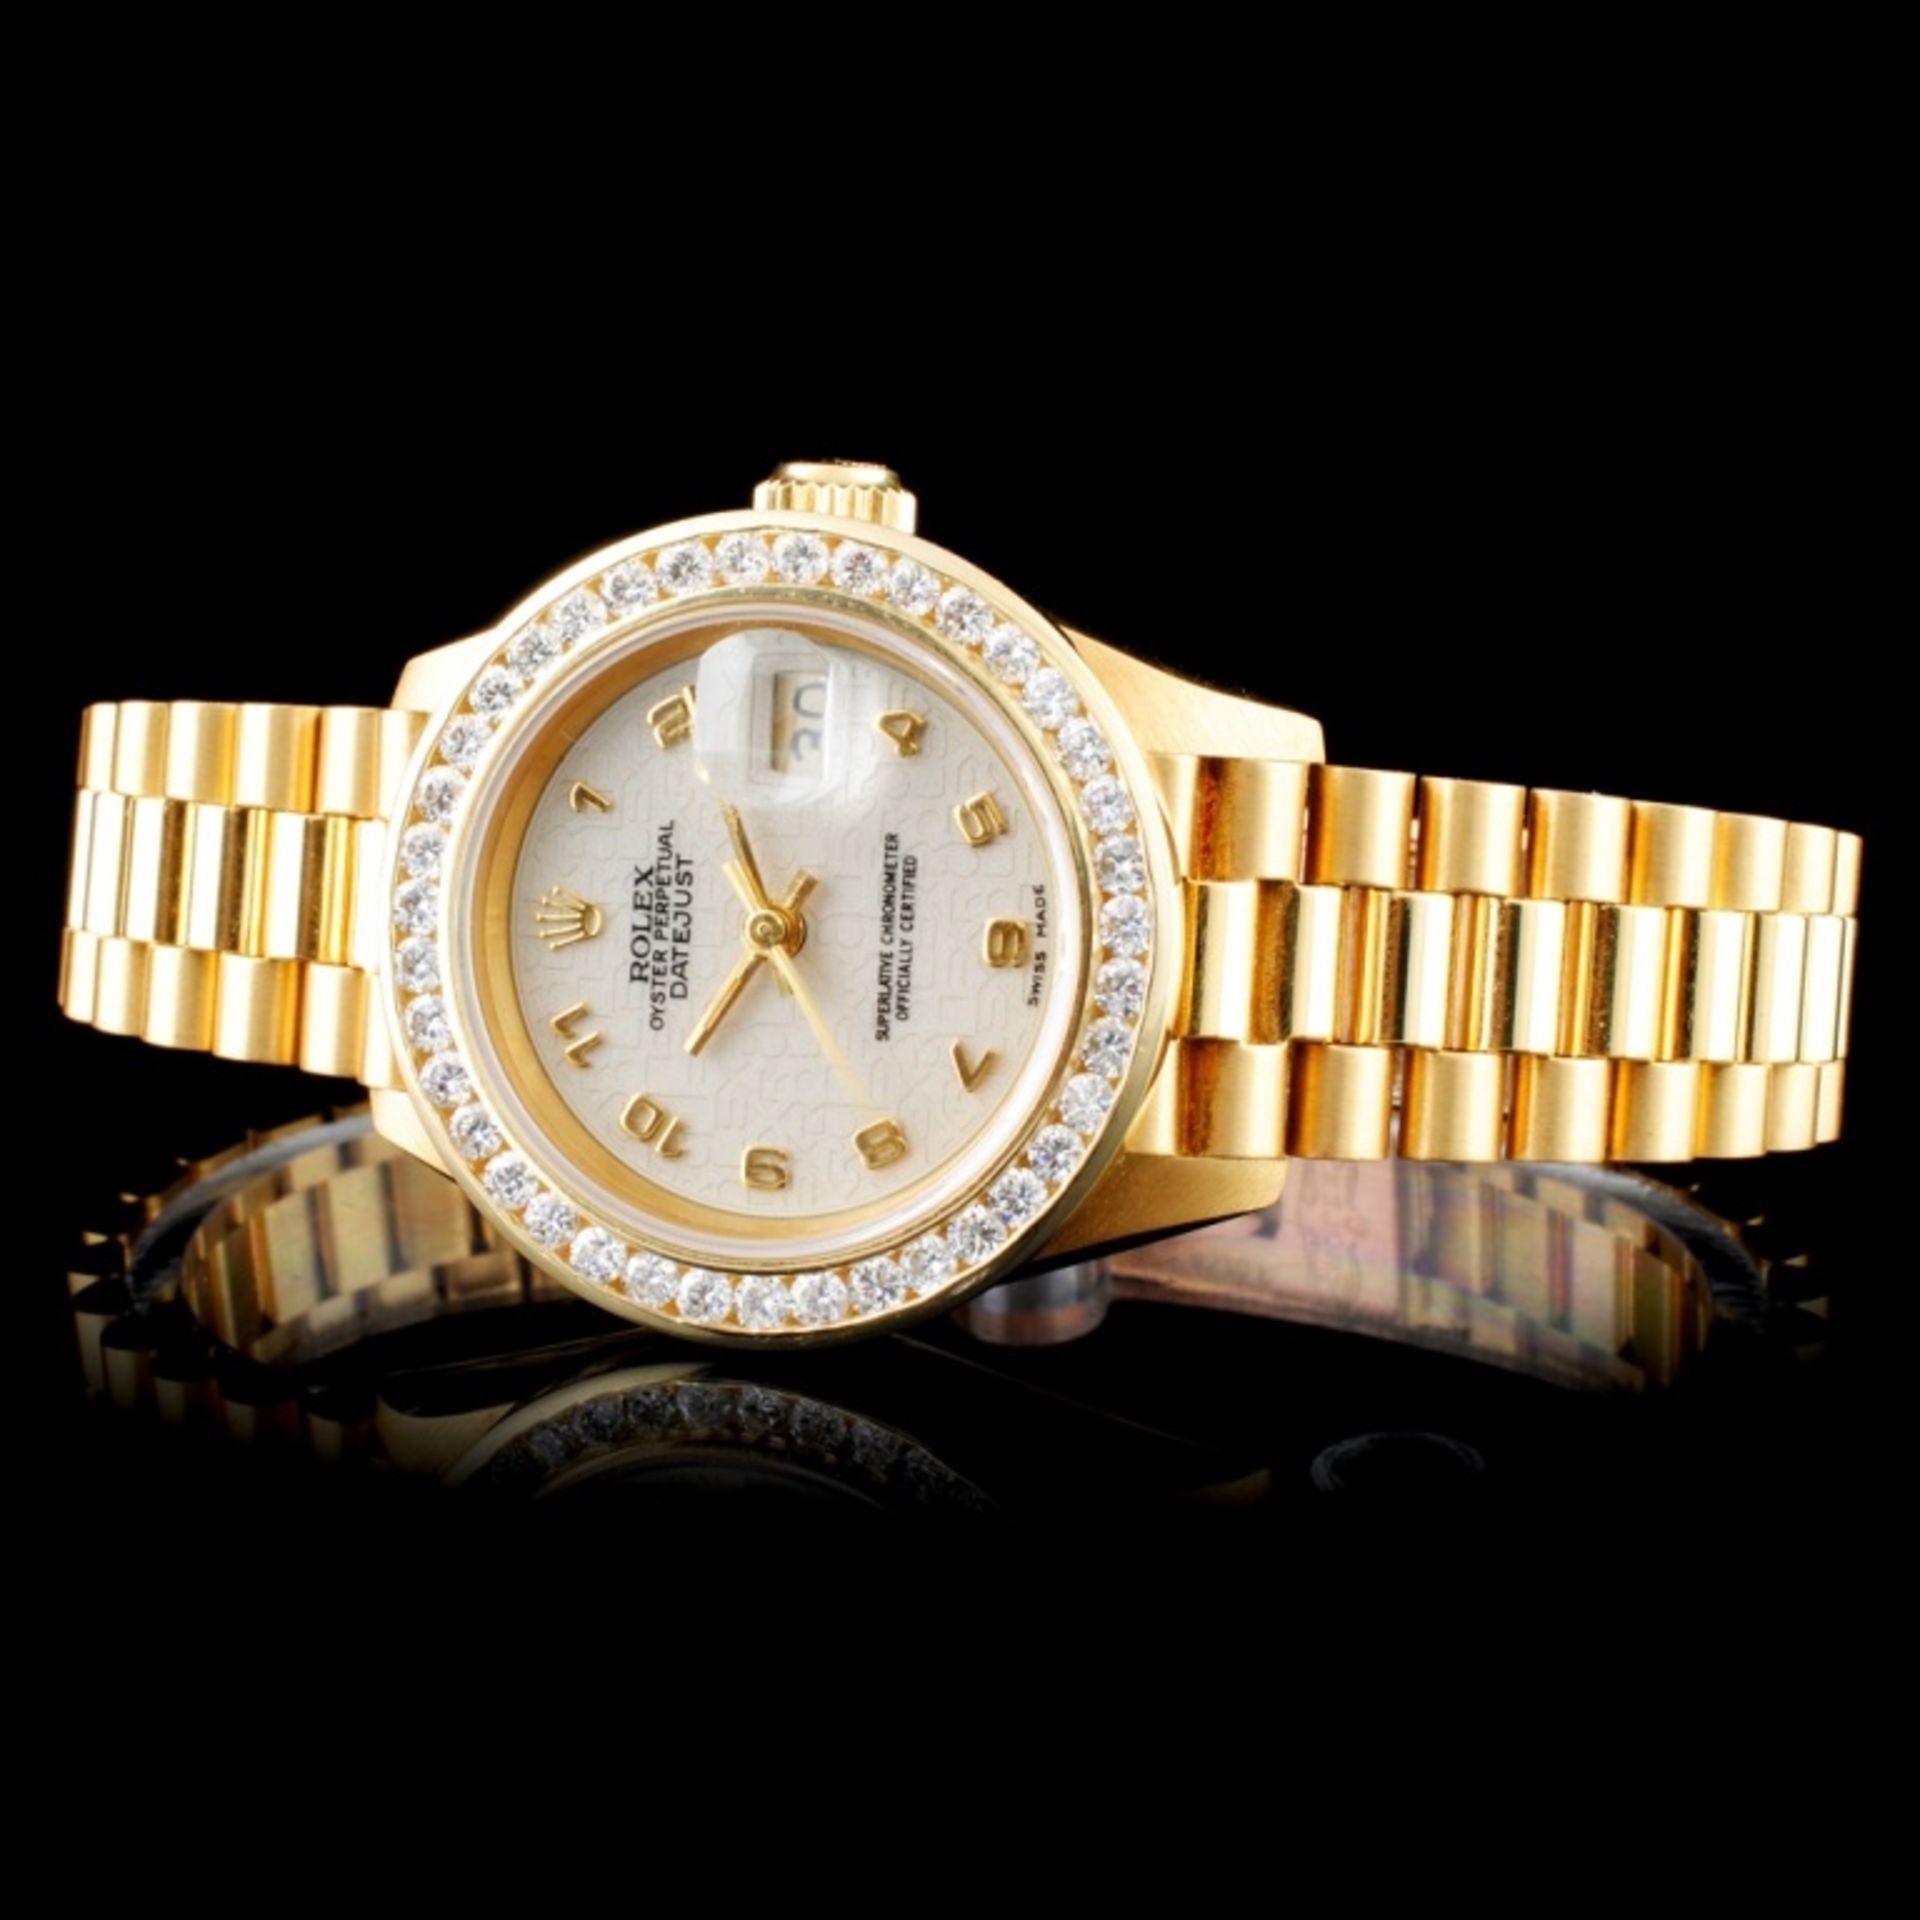 Rolex Presidential Diamond Ladies Watch - Image 3 of 6